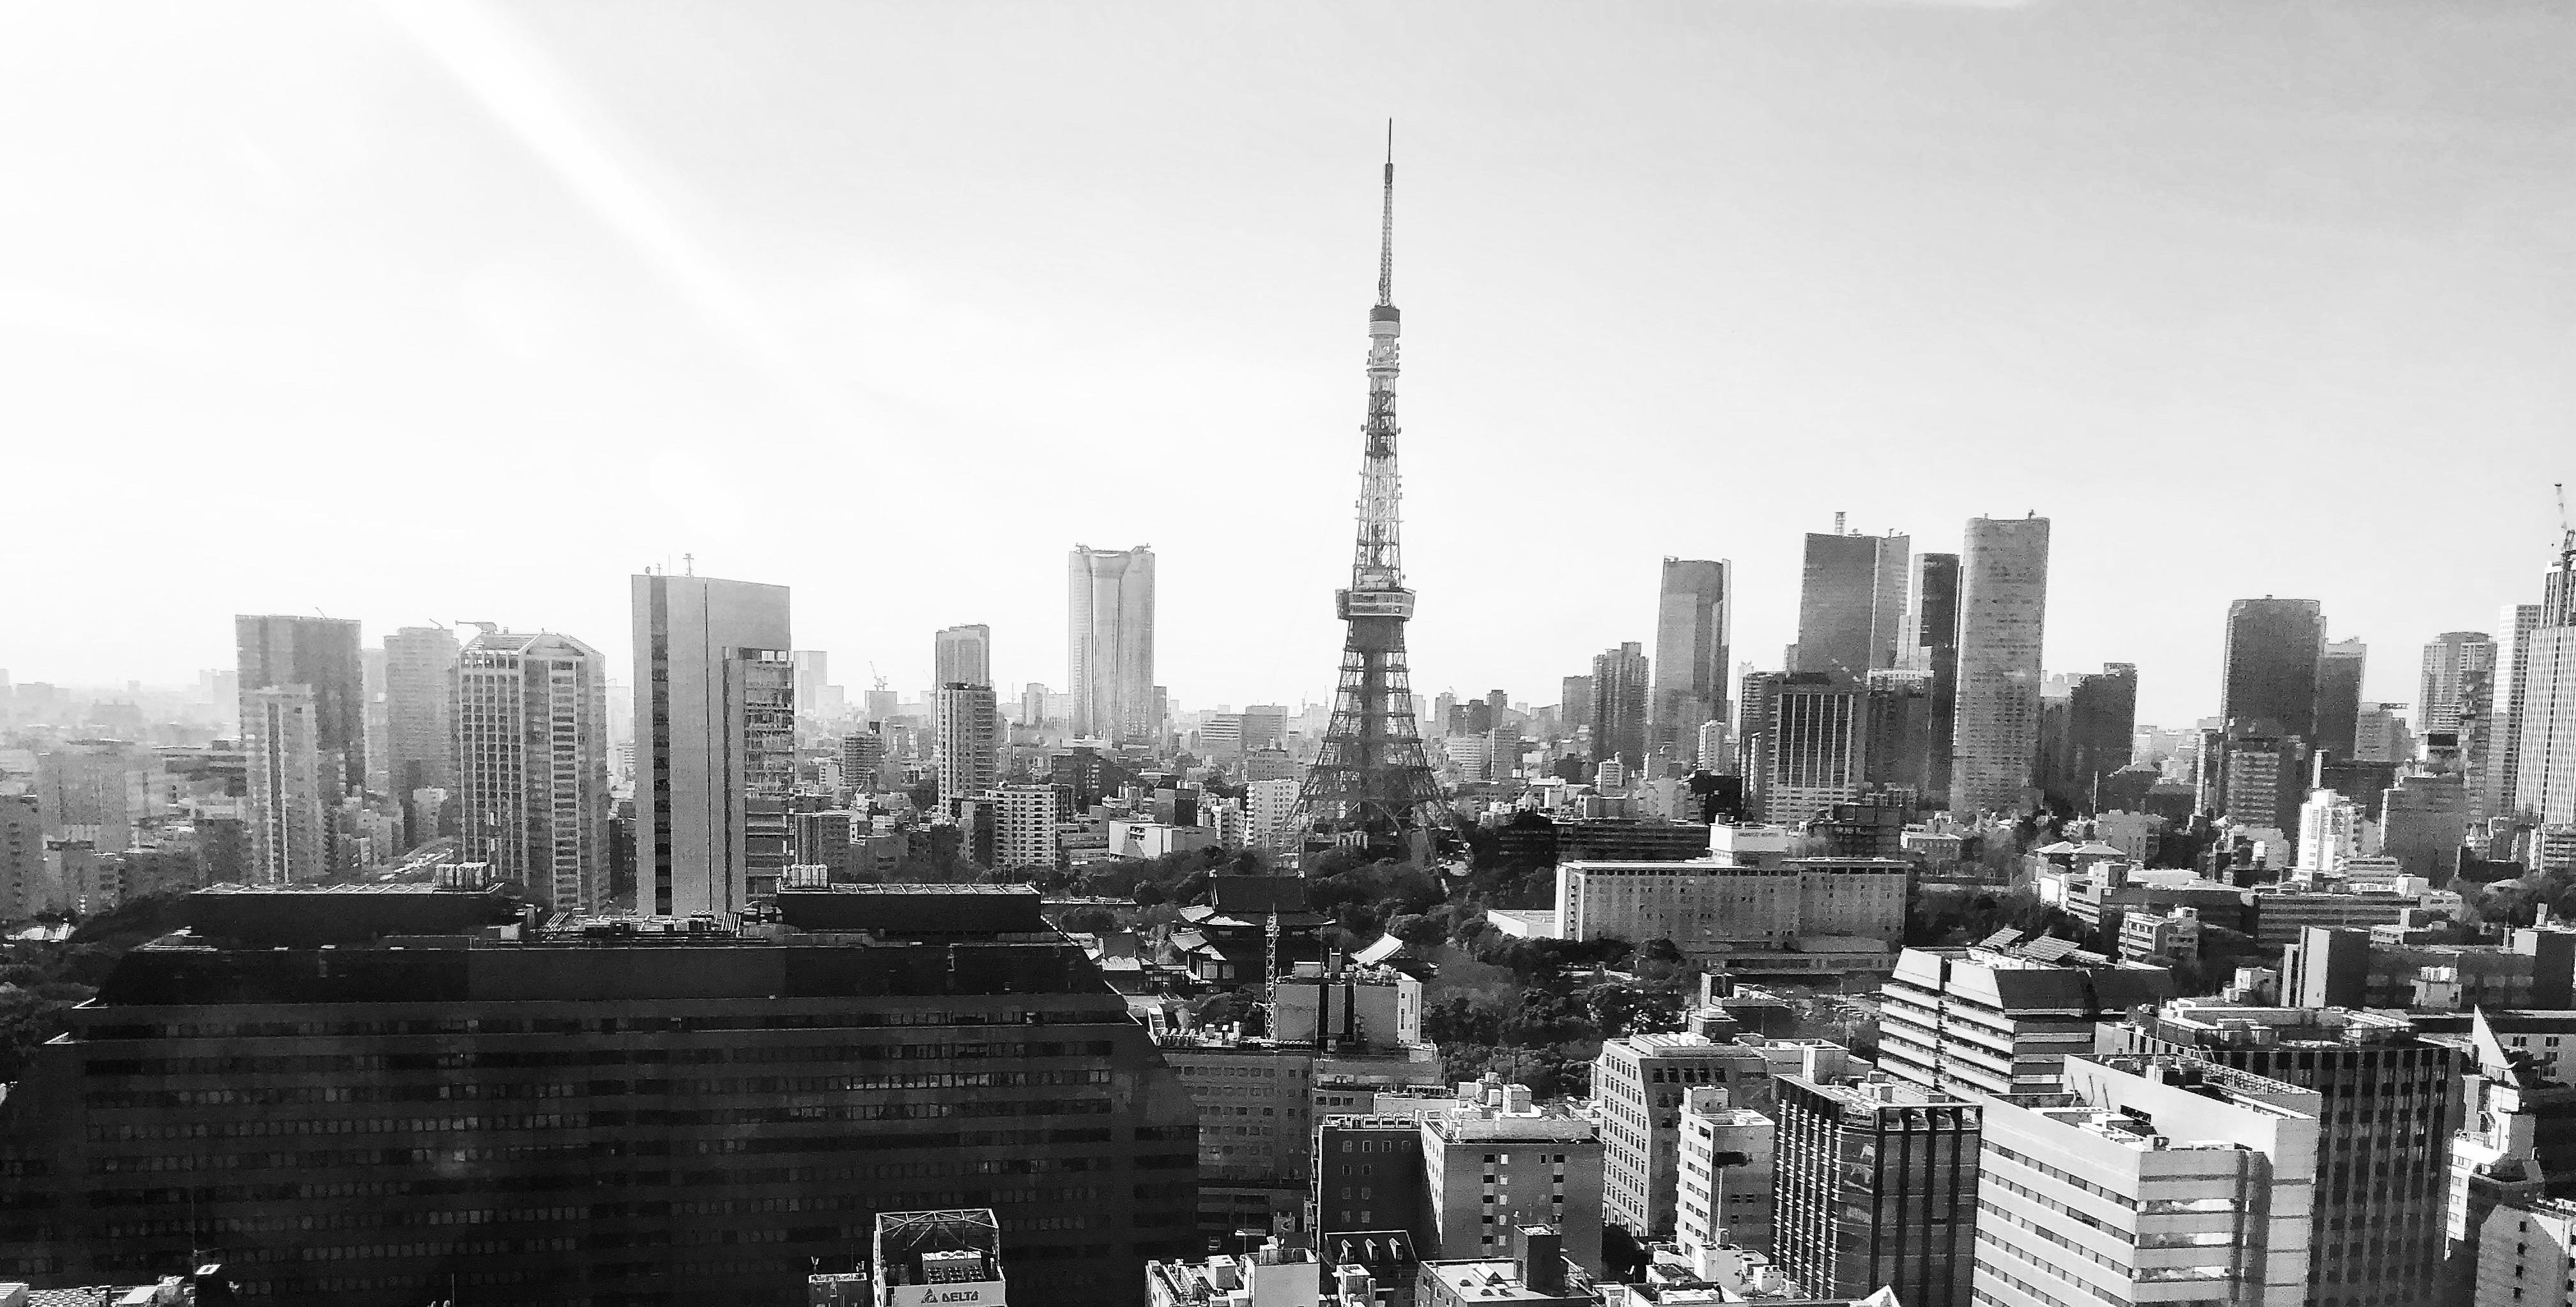 Tokyo skyline view from Asahi Broadcasing Corporation